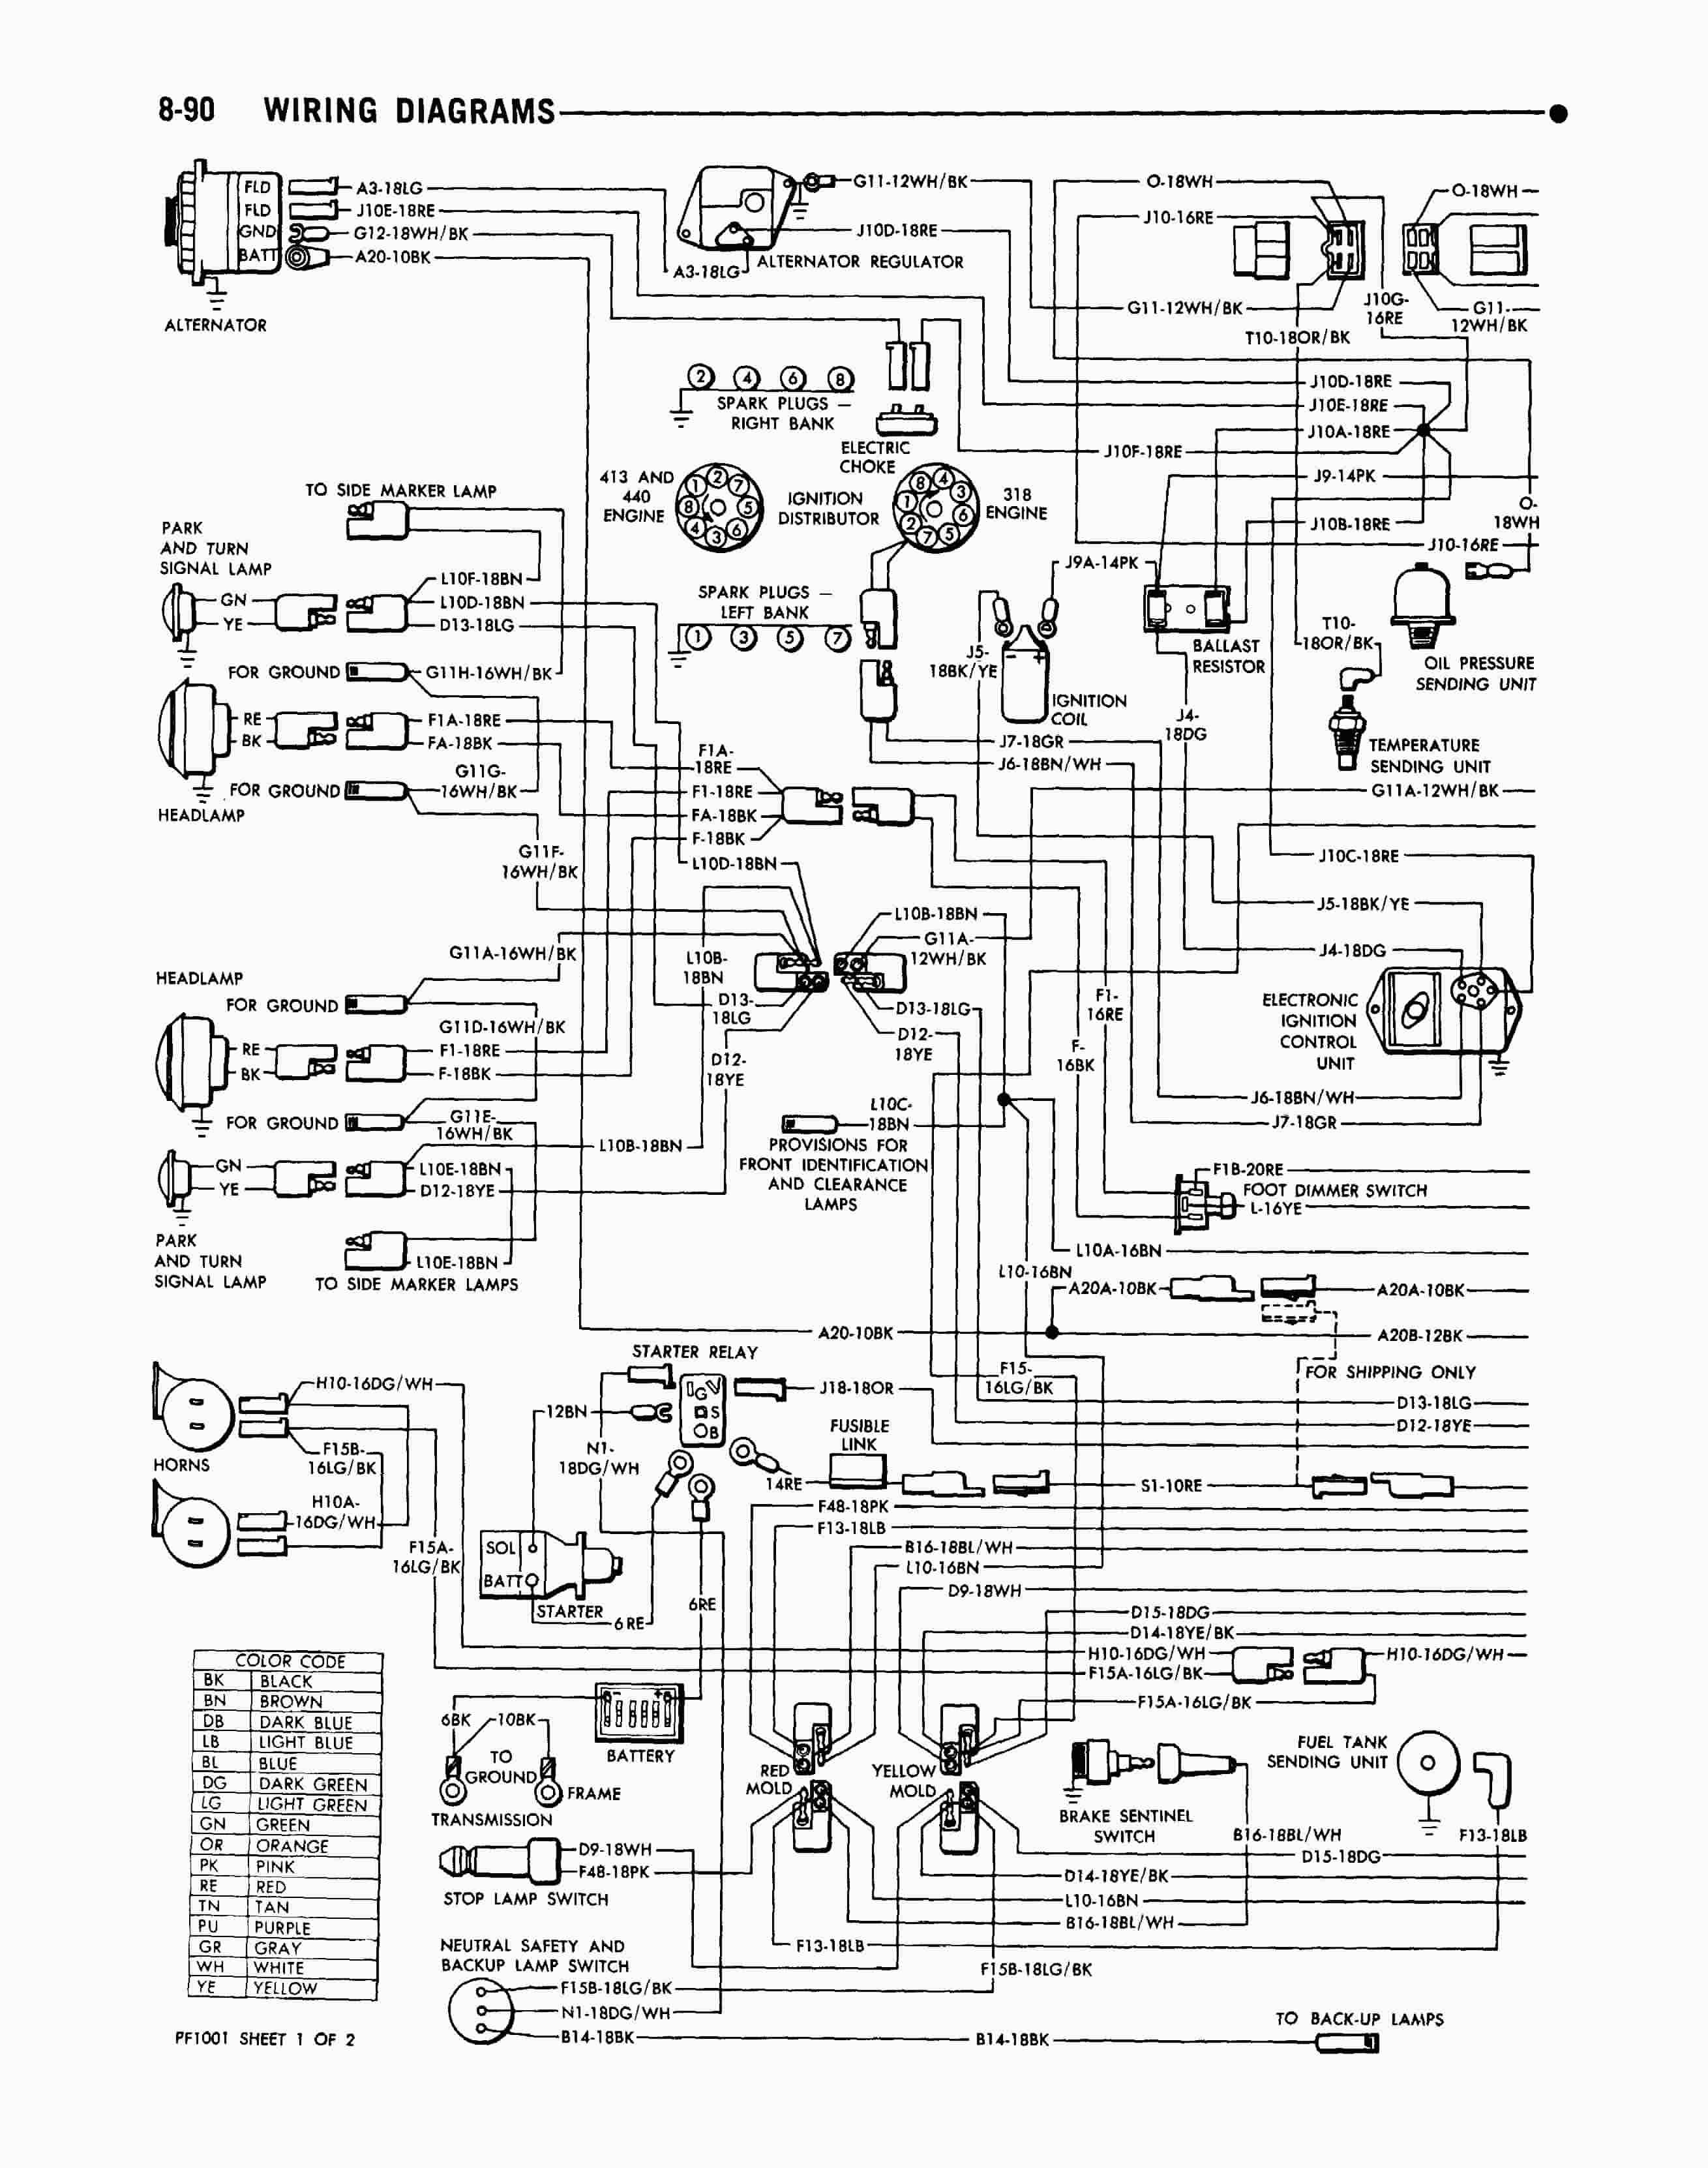 Keystone Travel Trailer Wiring Diagram | Wiring Diagram - Keystone Rv Wiring Diagram